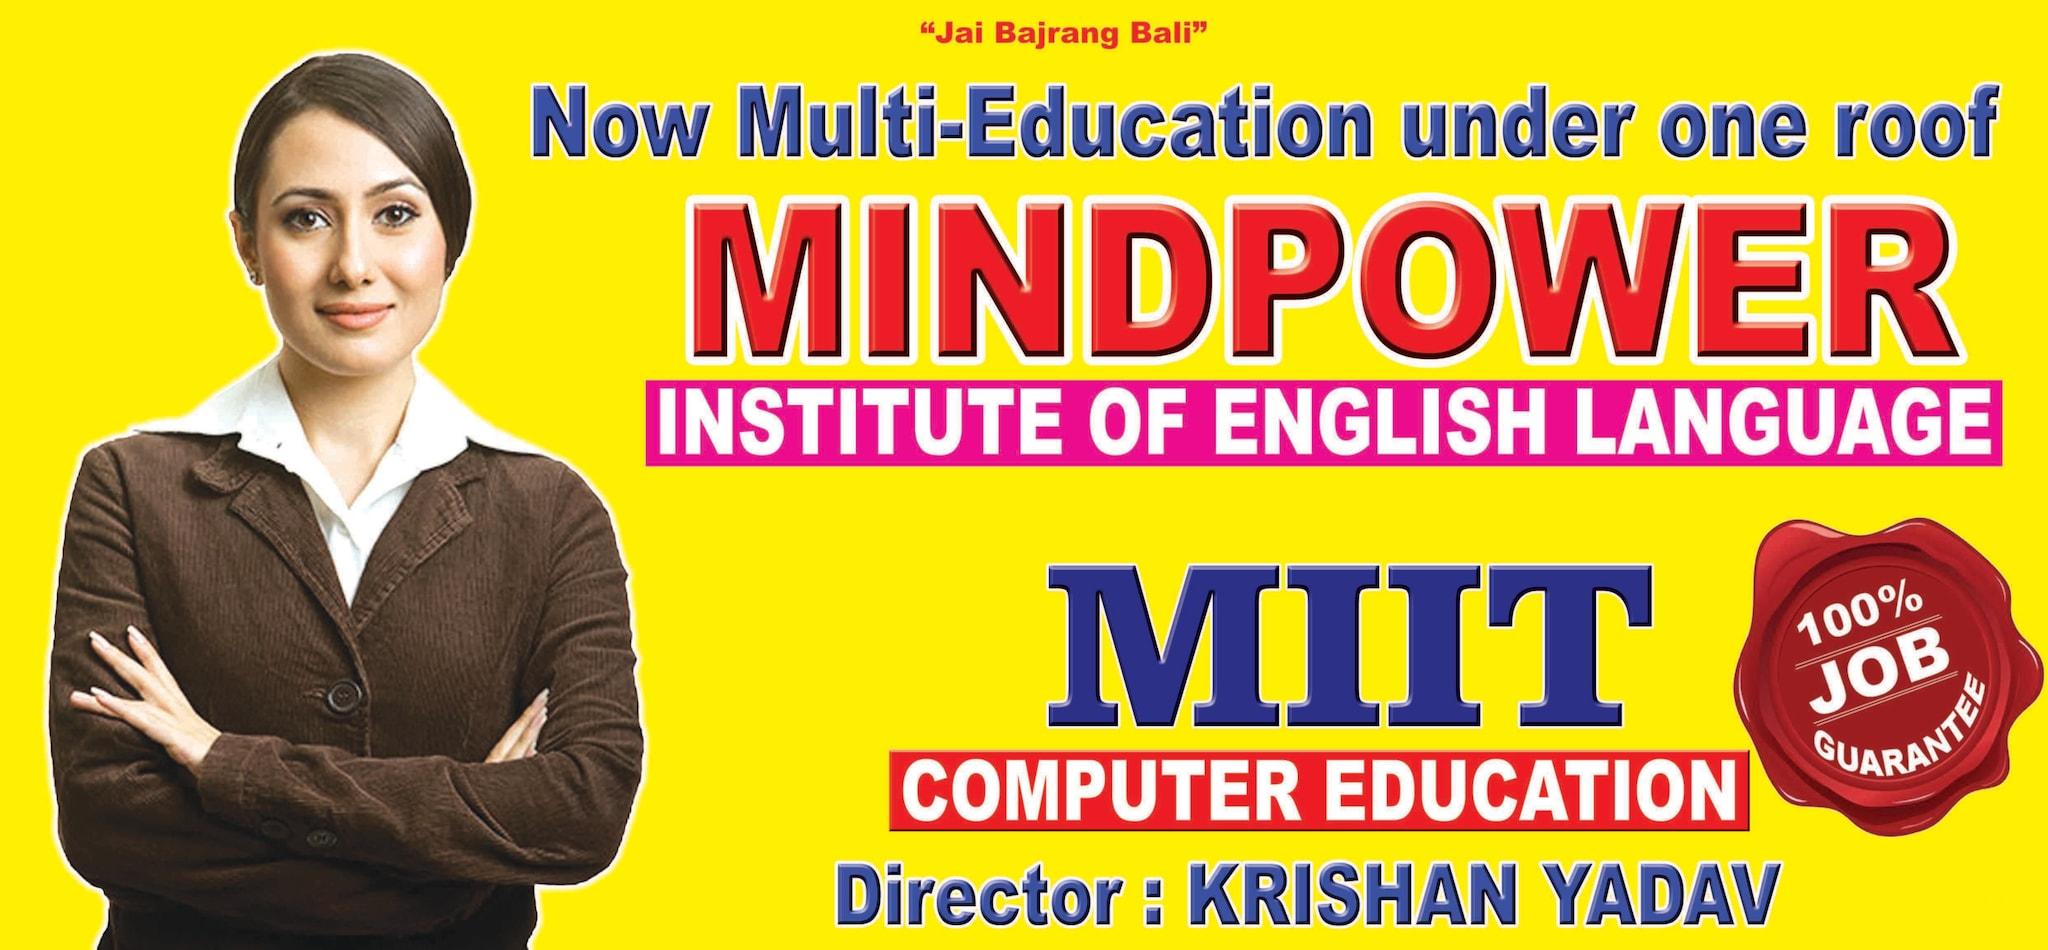 AUTOCAD Mep Training Institutes in Brass Market, Rewari - Computer